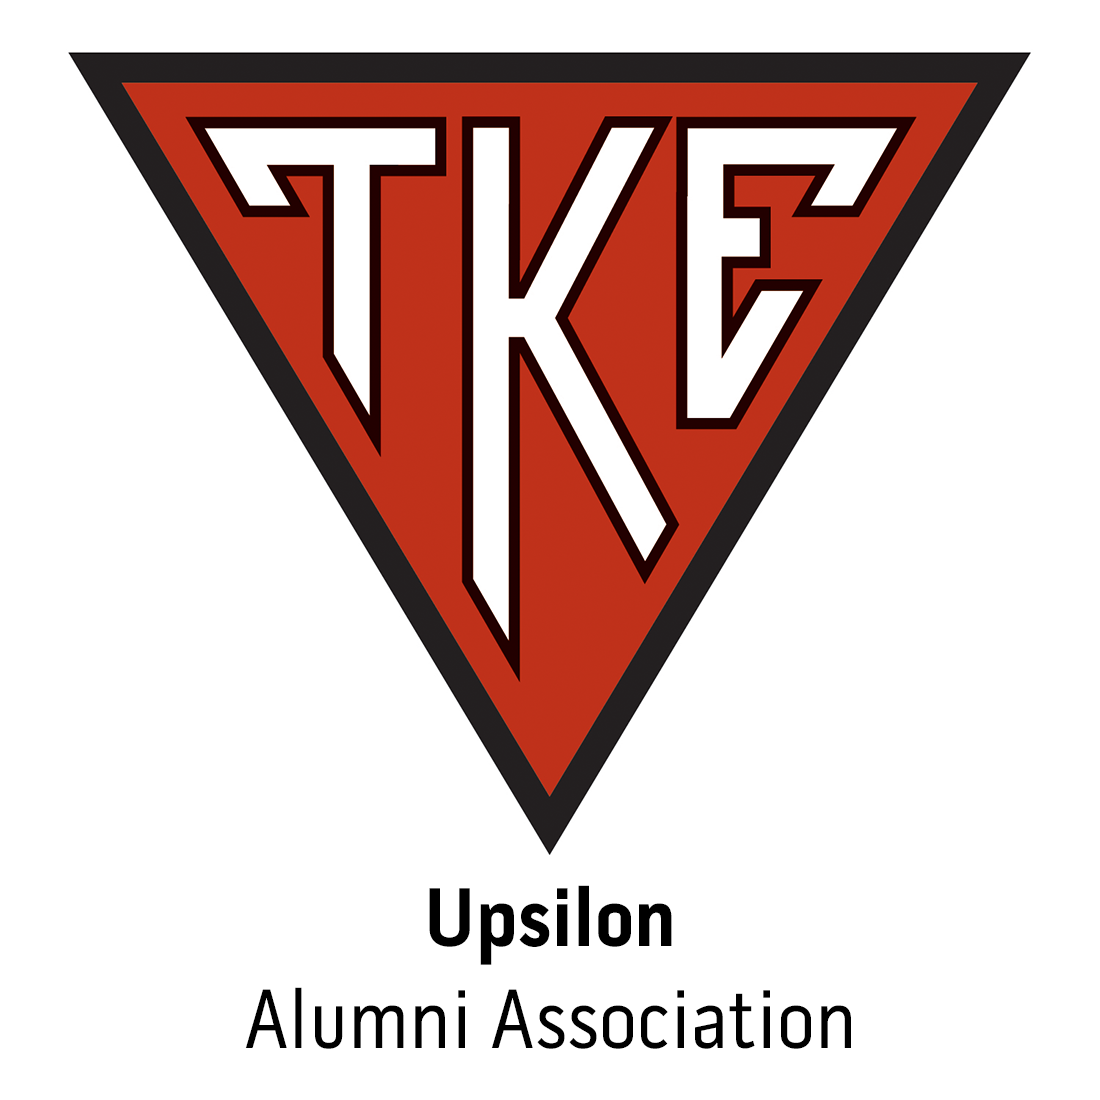 Upsilon Alumni Association for University of Michigan